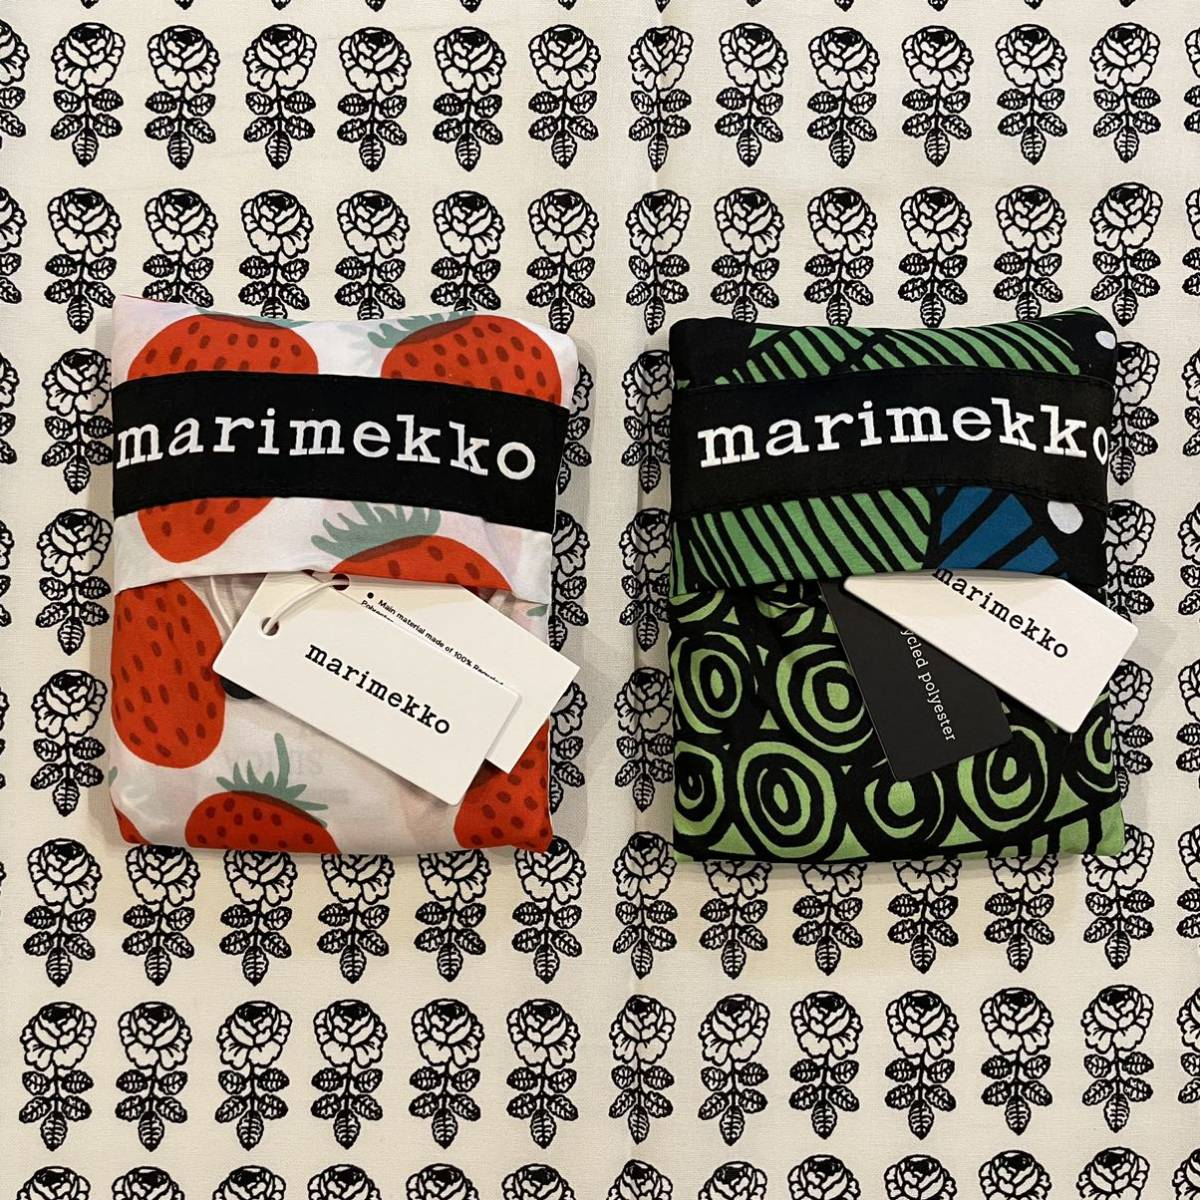 marimekko マリメッコ 新発売マンシッカ スマートバッグ2種 新品送料込_画像8